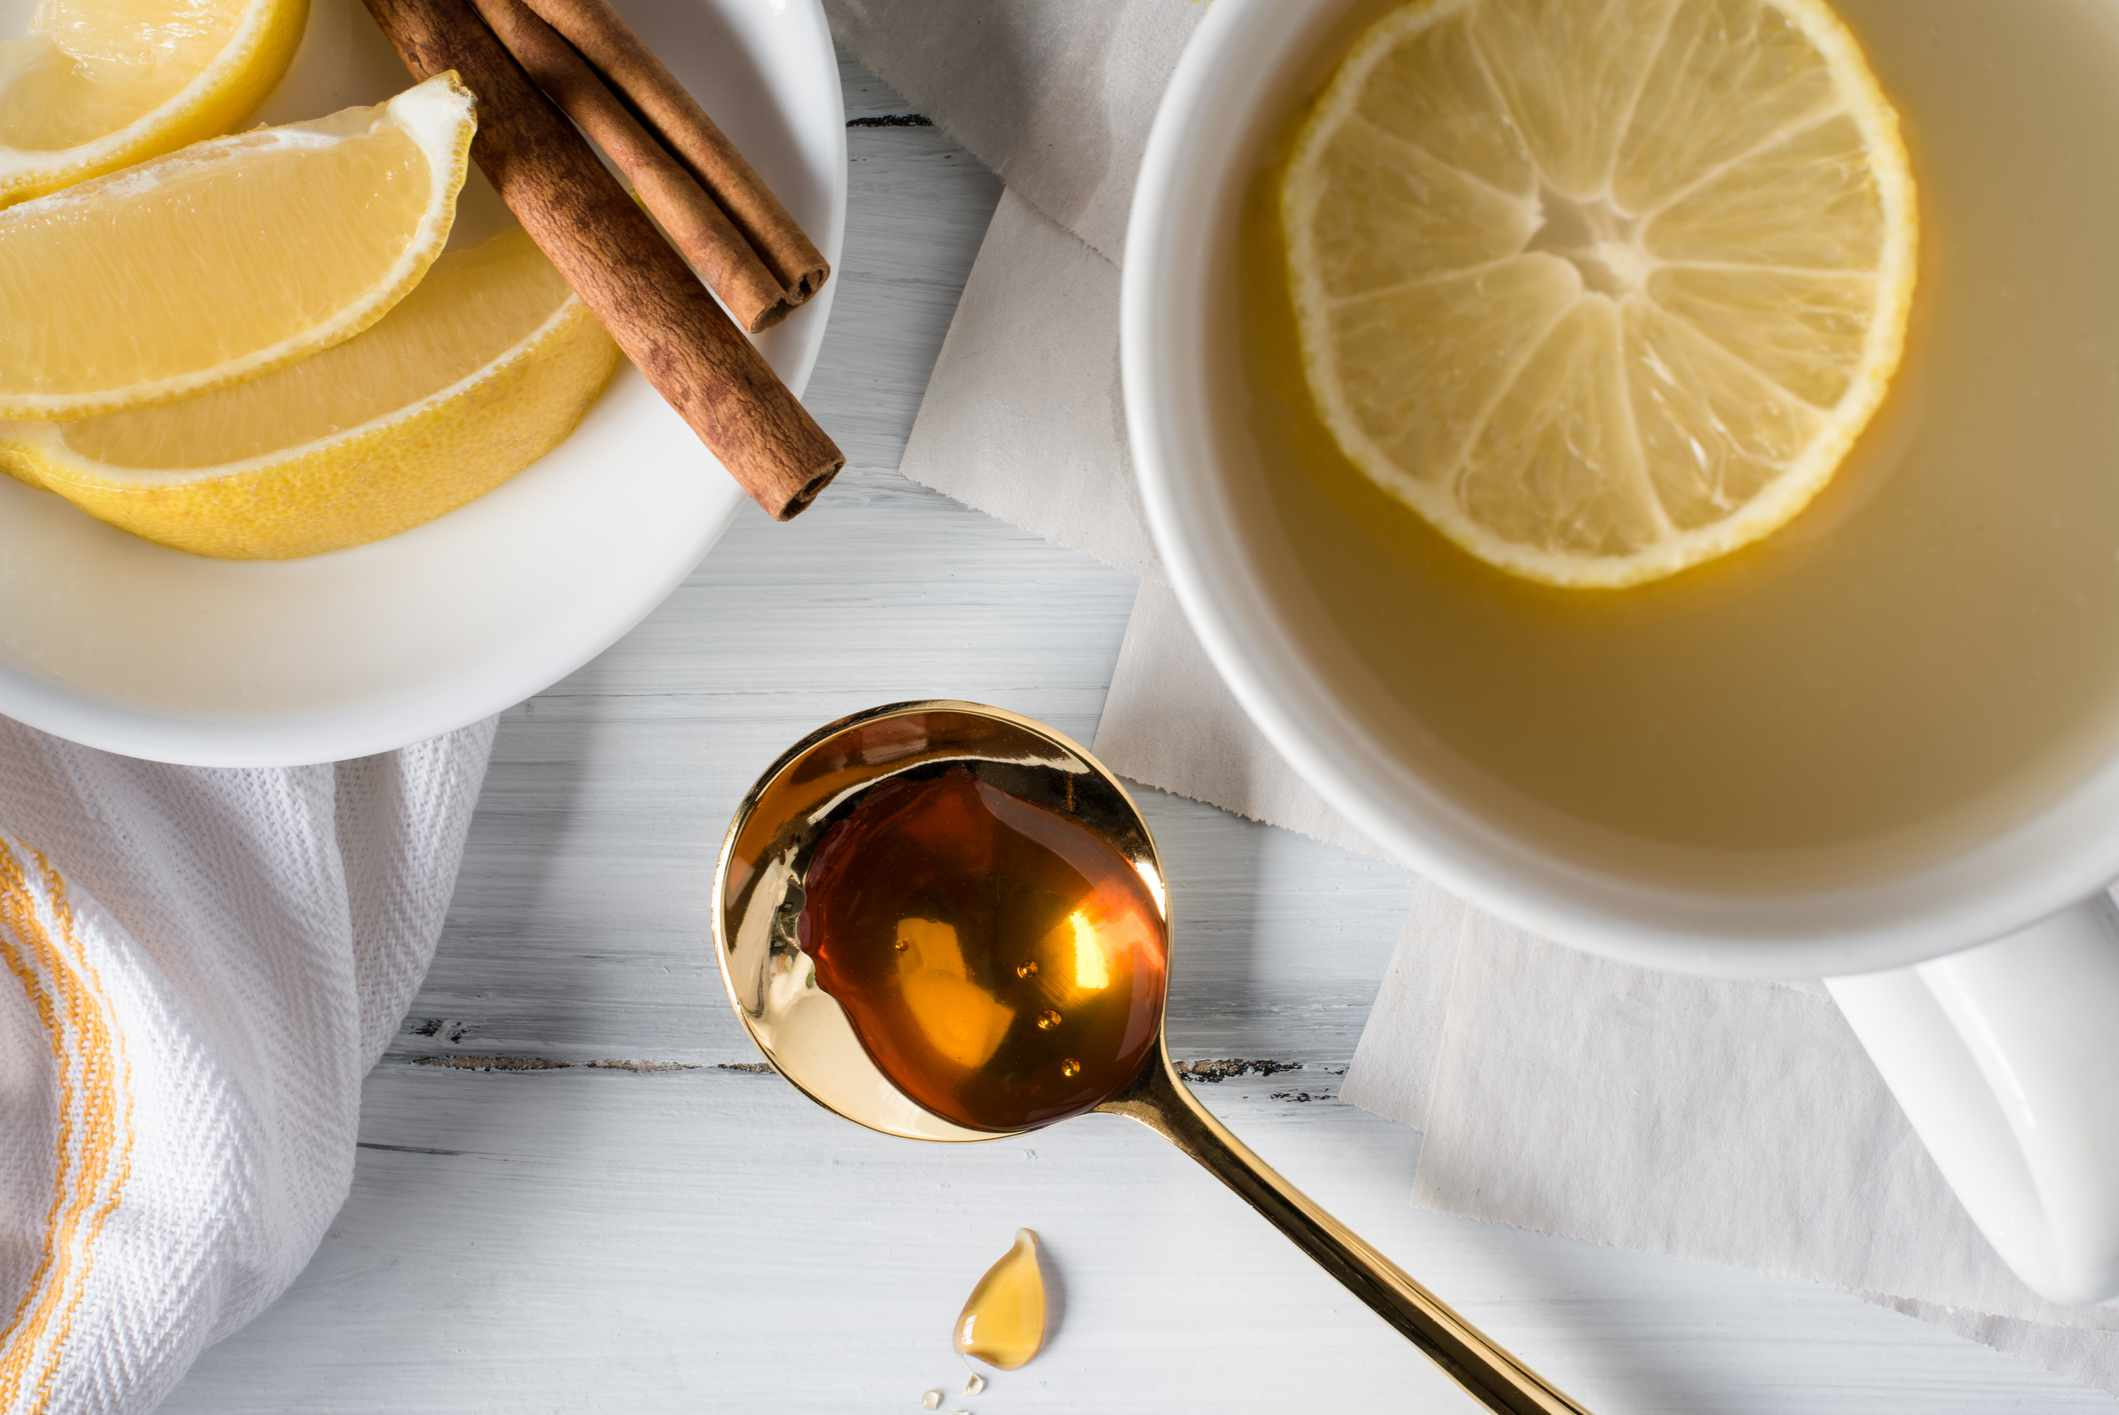 what are lemons